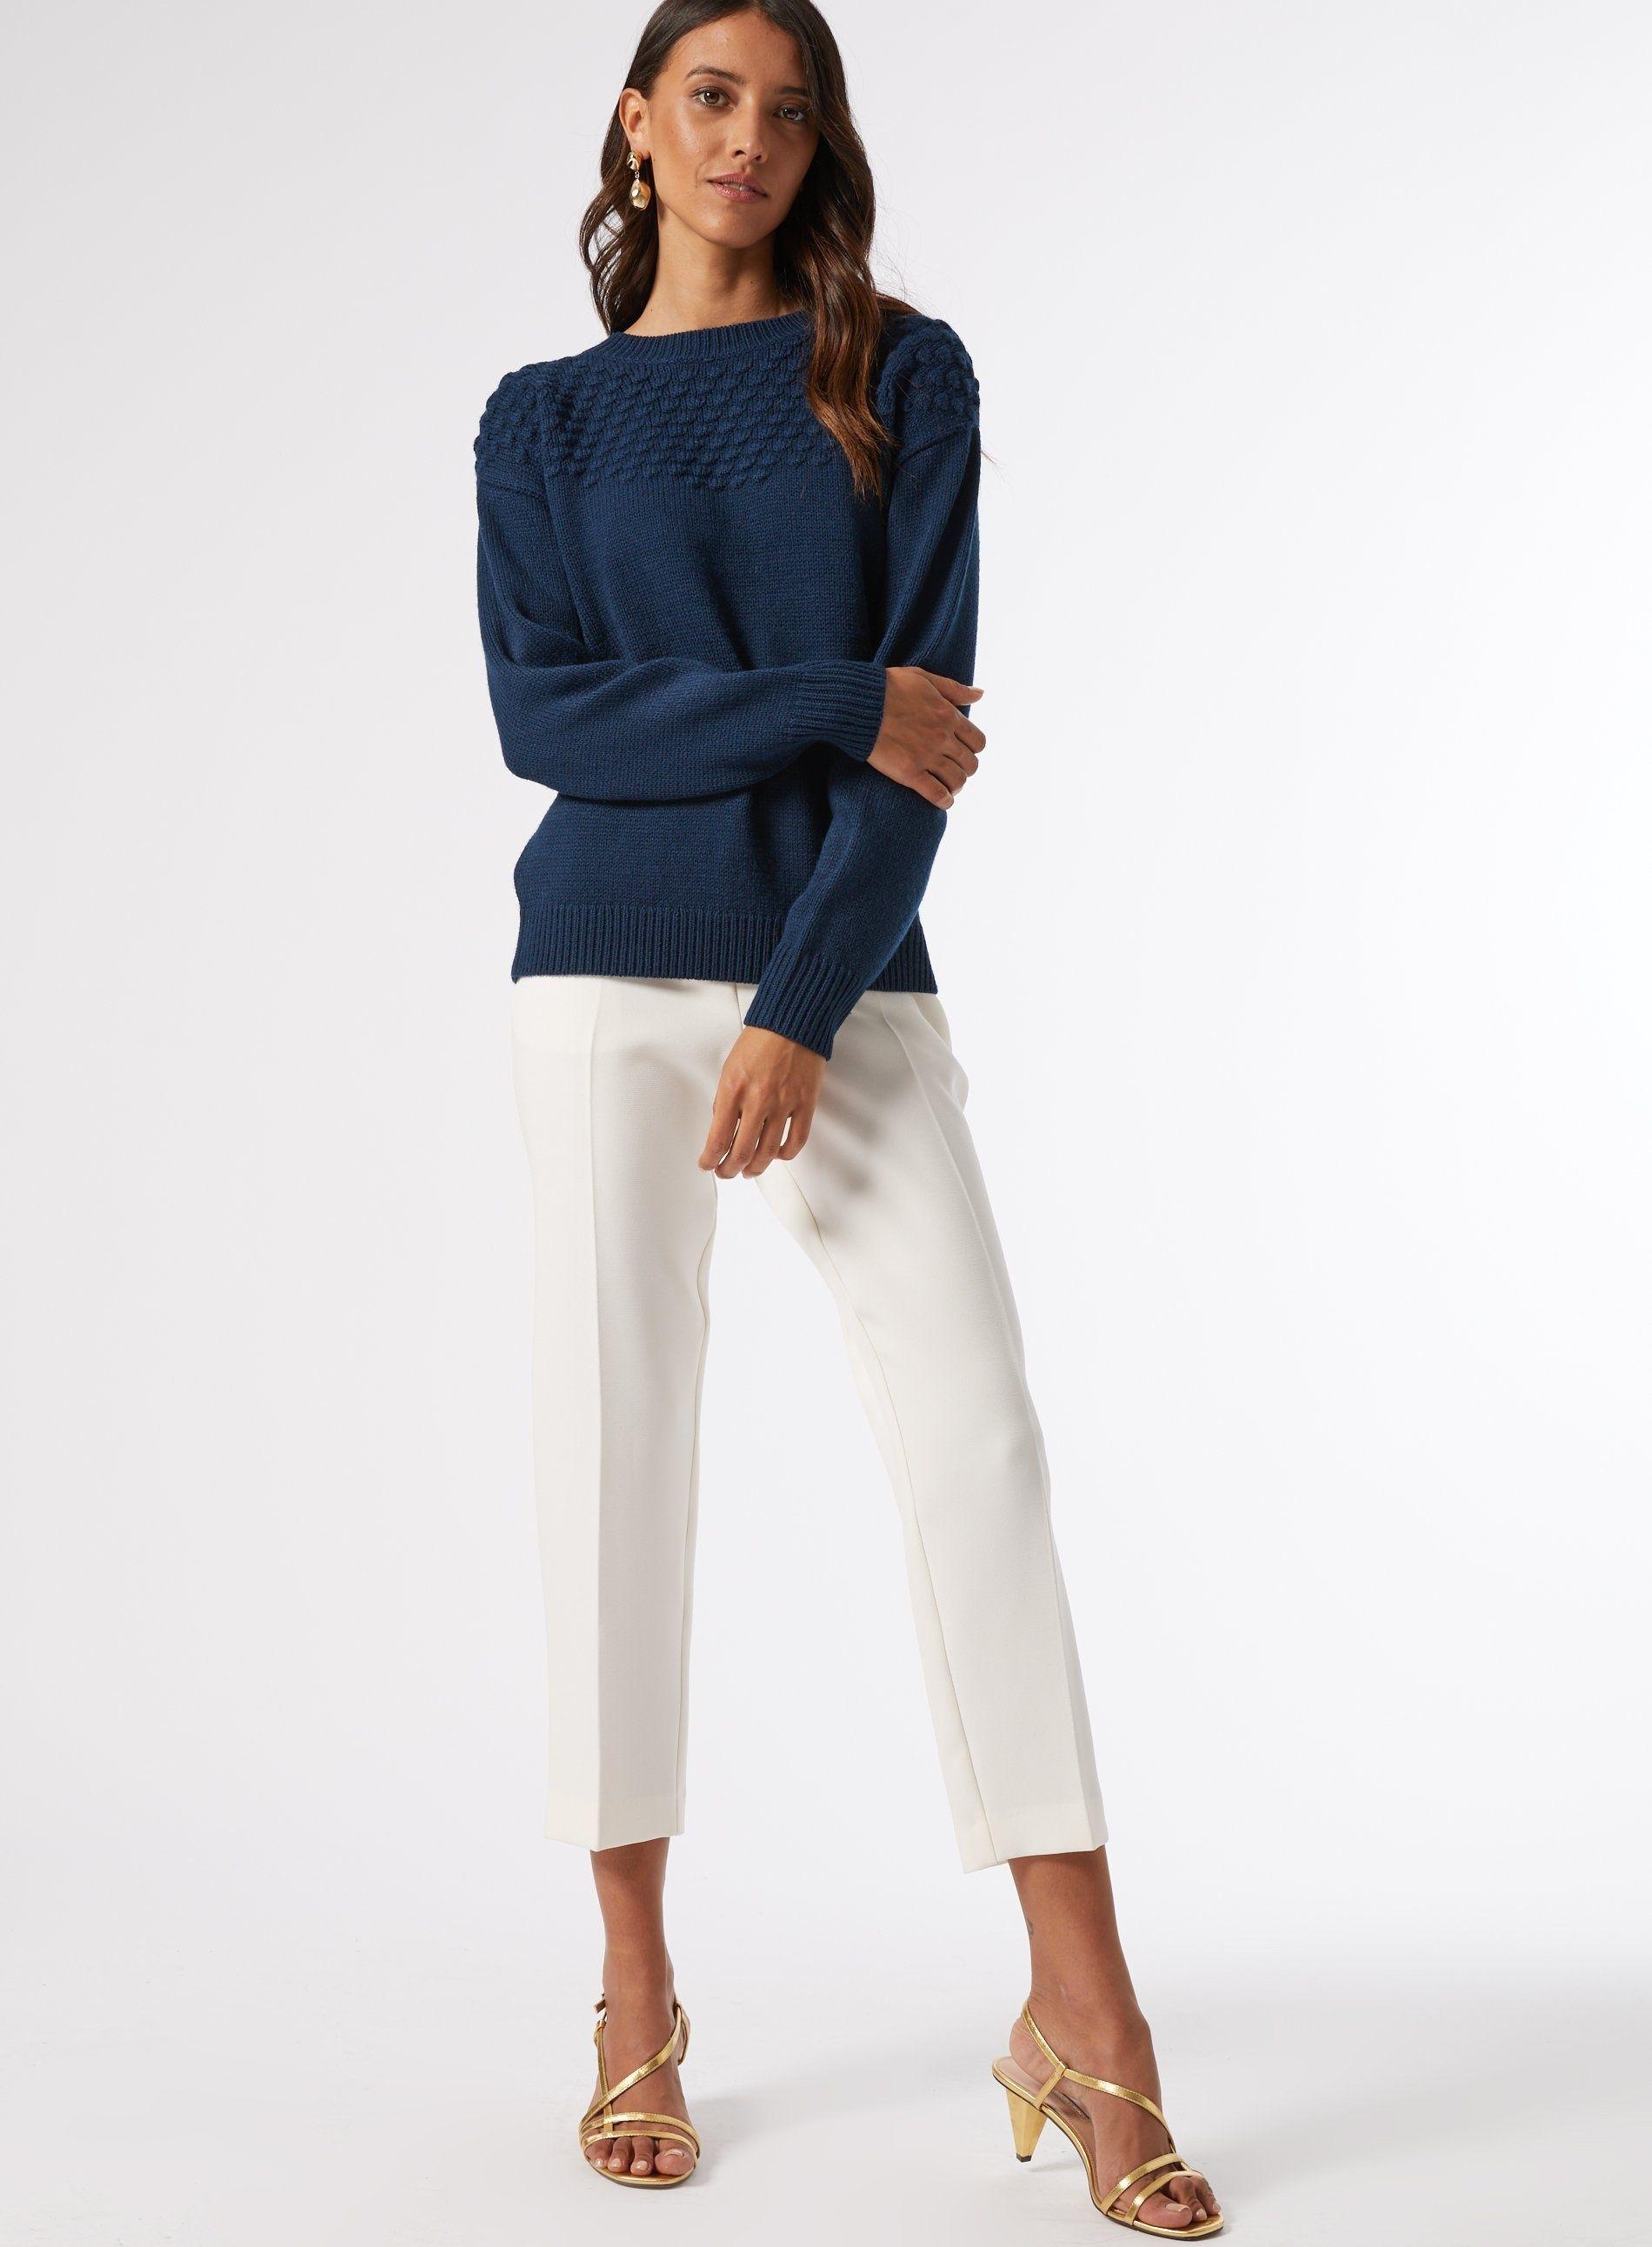 Dorothy Perkins Womens Teal Bobble Yoke Jumper Sweater Pullover Top Blouse